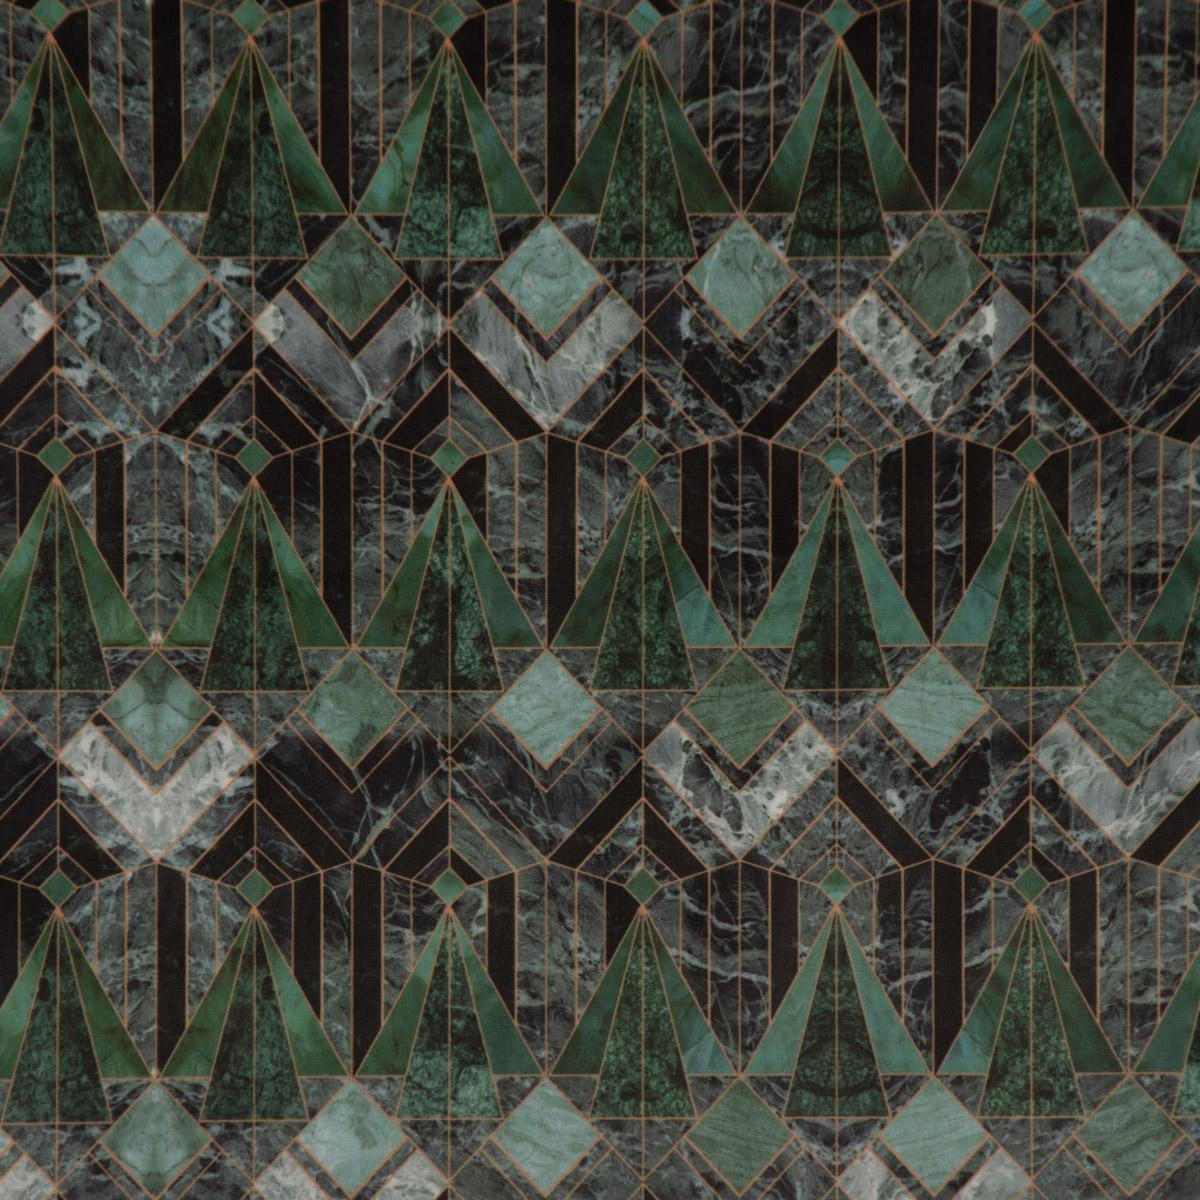 Samtstoff Dekostoff Velvet Deluxe Samt Art Deko Marble Diamond Marmor petrol grün 1,4m Breite